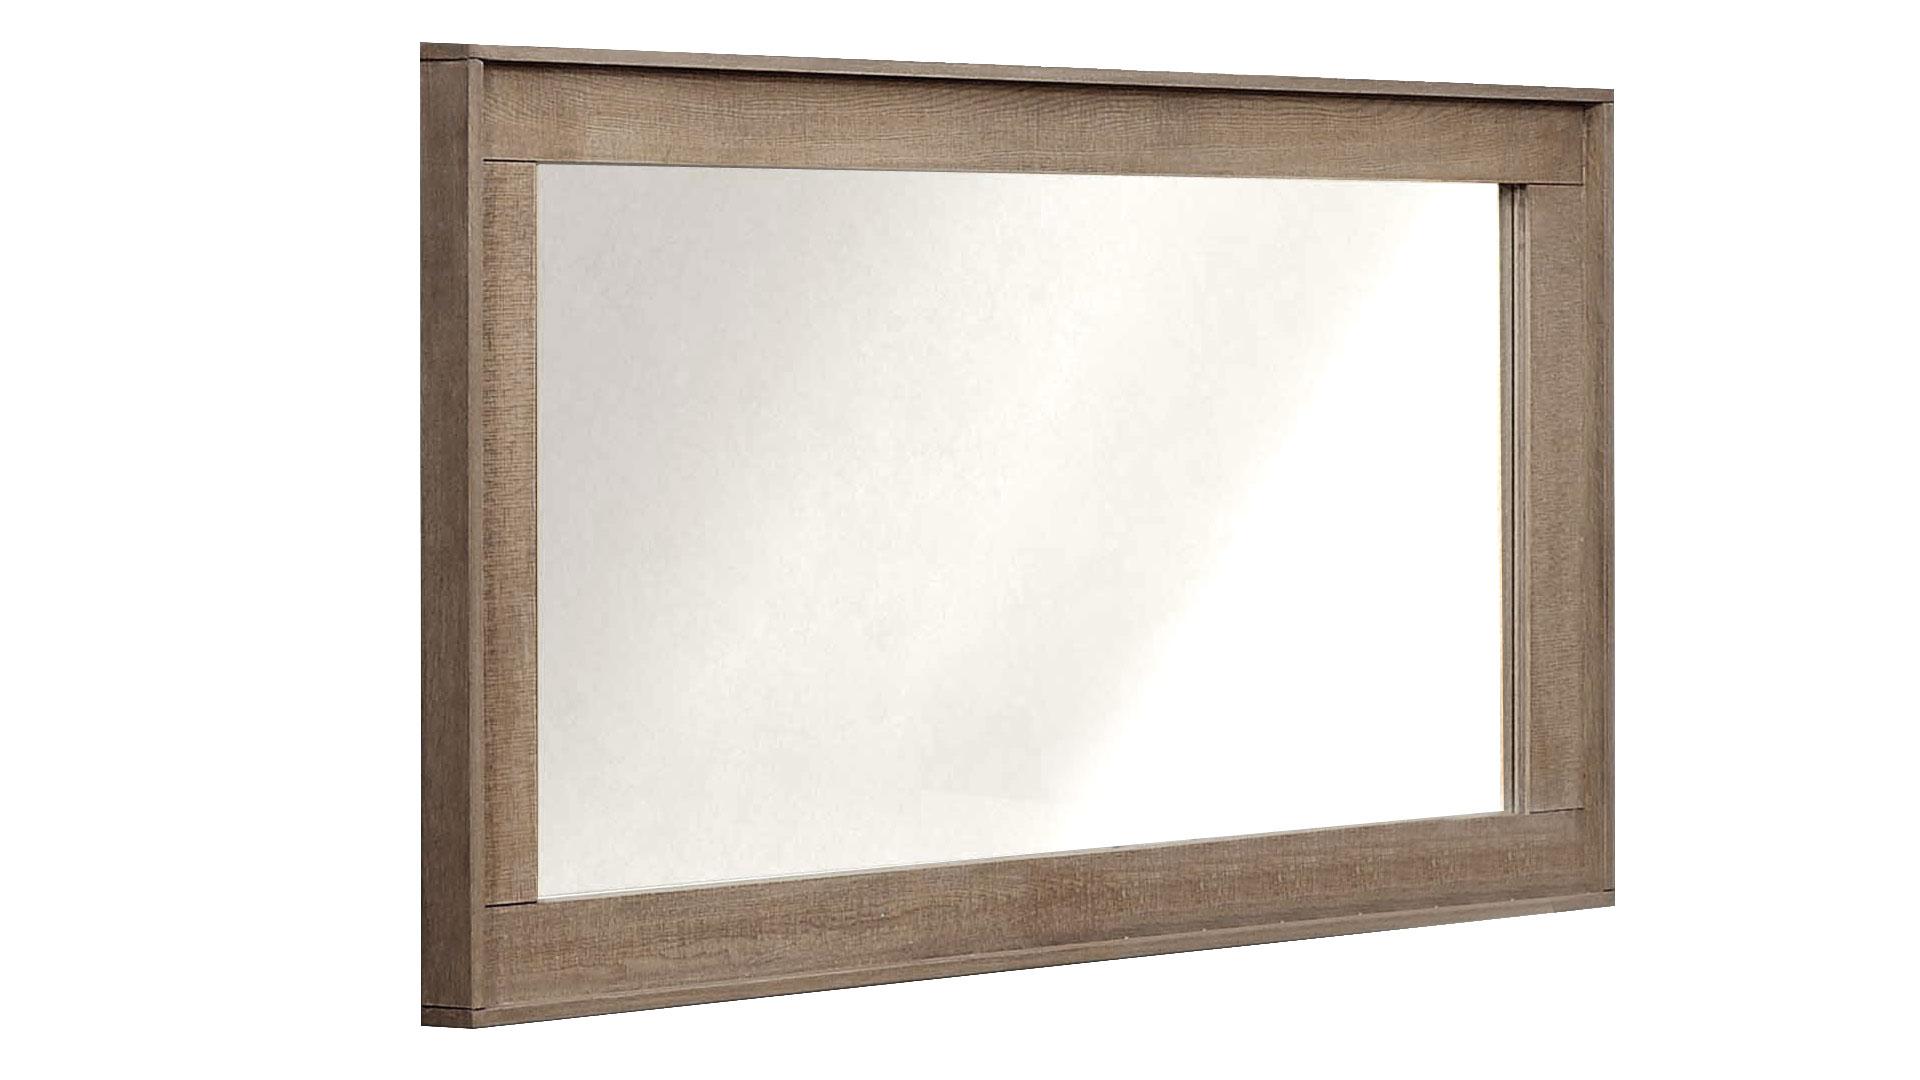 le blog mobiliermoss vente miroir design bois mobiliermoss cleveland moderne. Black Bedroom Furniture Sets. Home Design Ideas